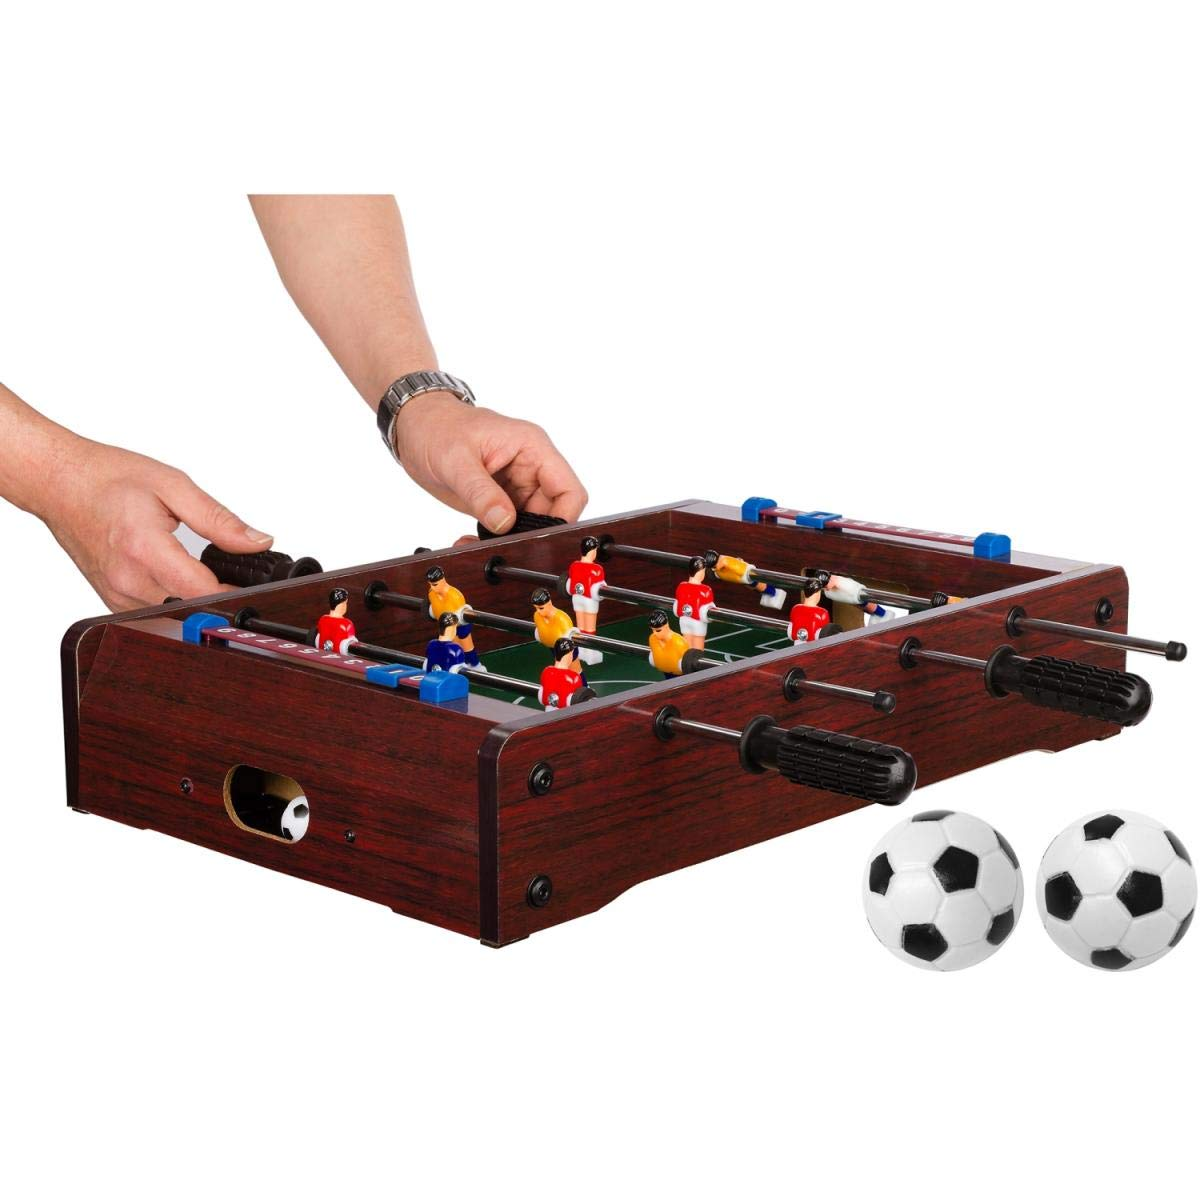 dimensions: 51/x 31/x 8/cm 3/d/écor variantes de jeu avec 2/balles poids: 2,6/kg Mini table Football 4/barres